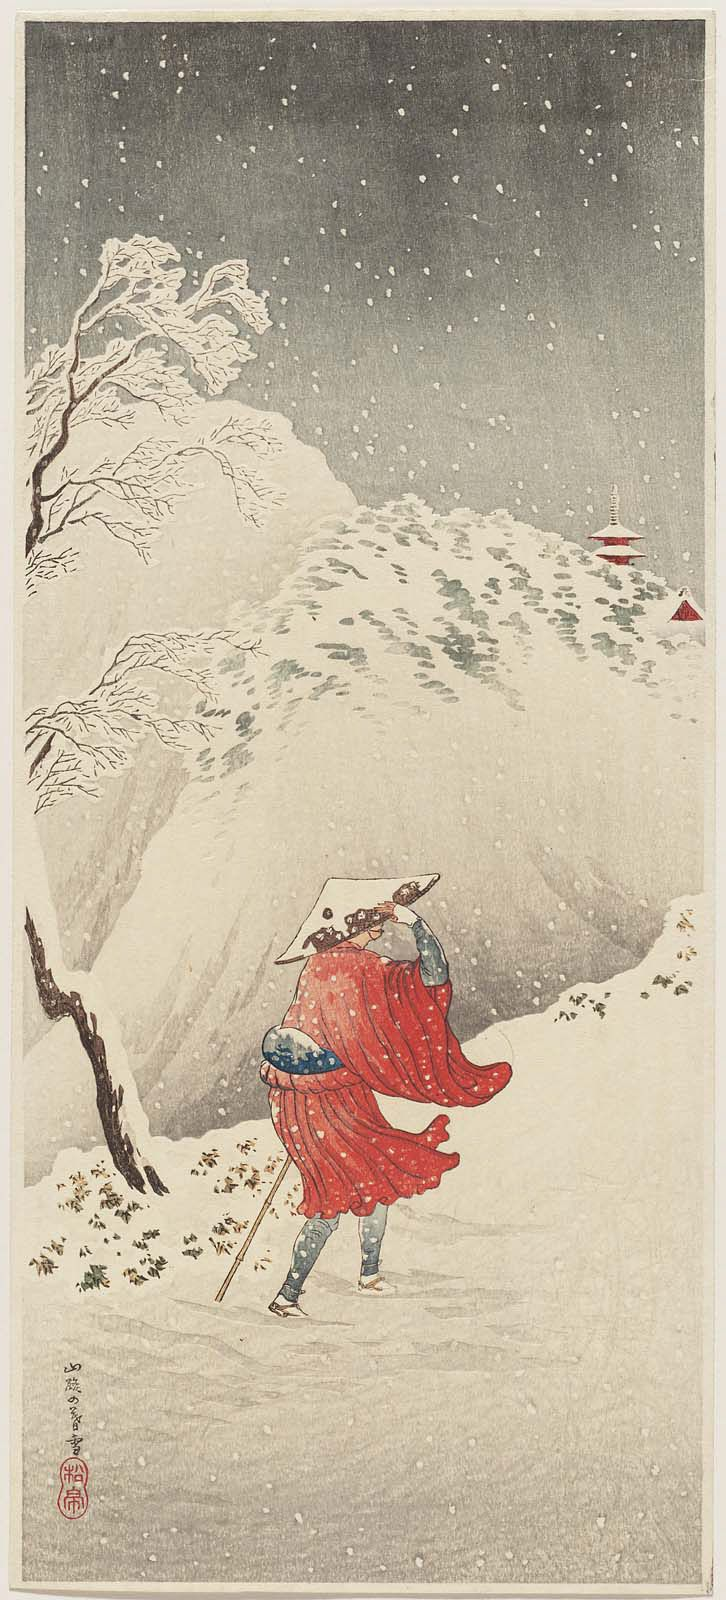 'Twilight Snow on the Mountain Road' (circa 1936) by Takahashi Hiroaki (Shôtei) (1871–1945). Publisher Watanabe Shôzaburô Image and text courtesy MFA Boston.